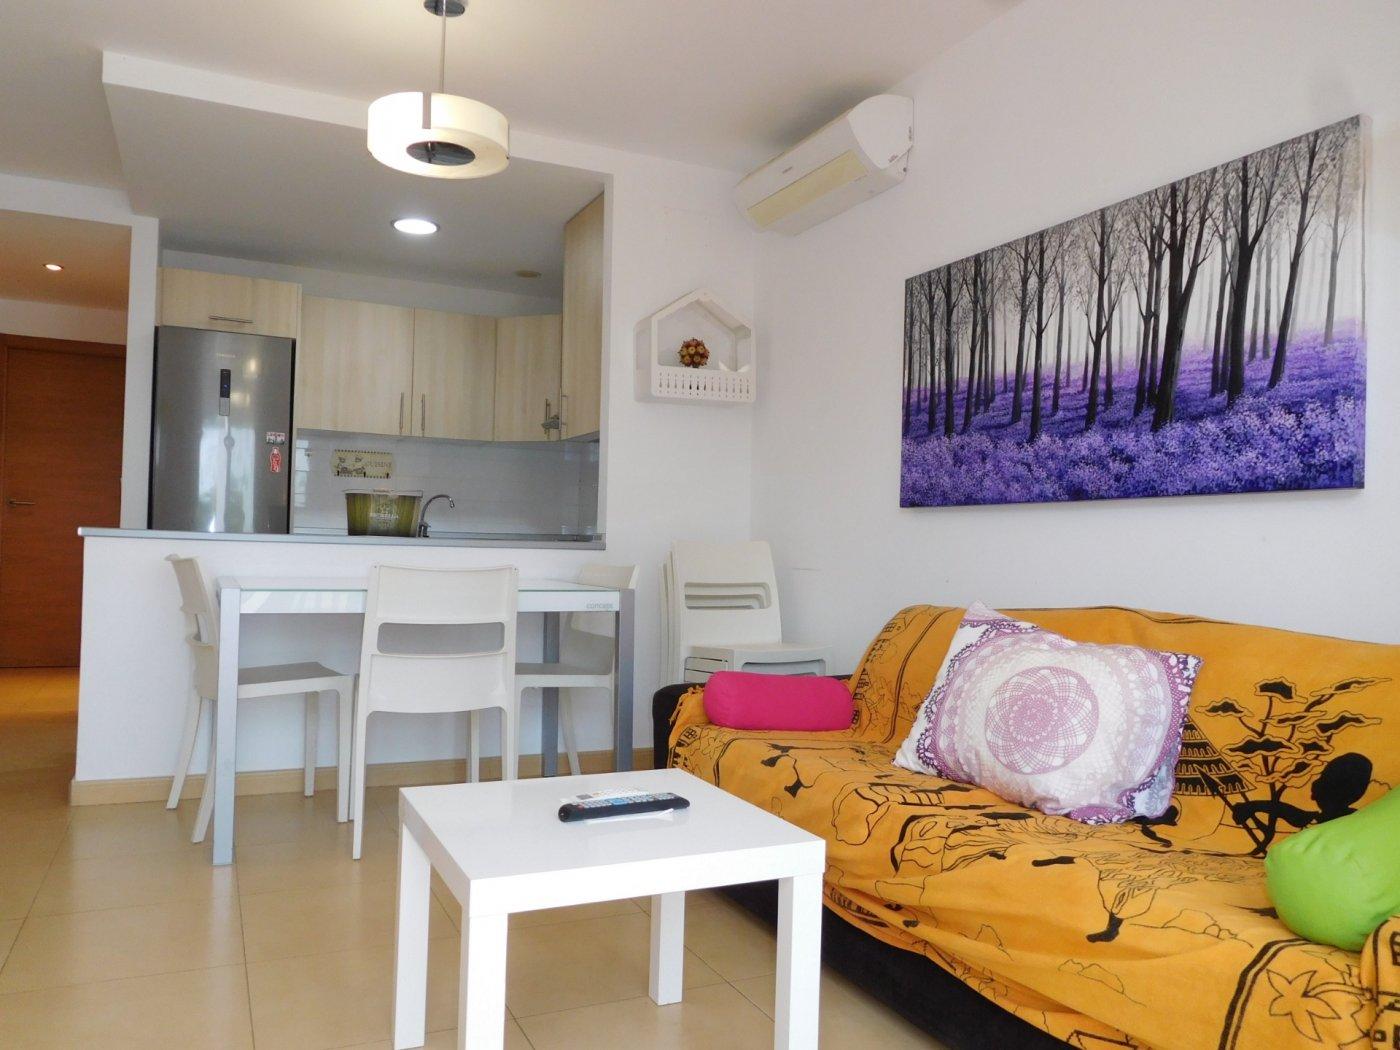 Gallery Image 15 of Apartment For rent in Condado De Alhama, Alhama De Murcia